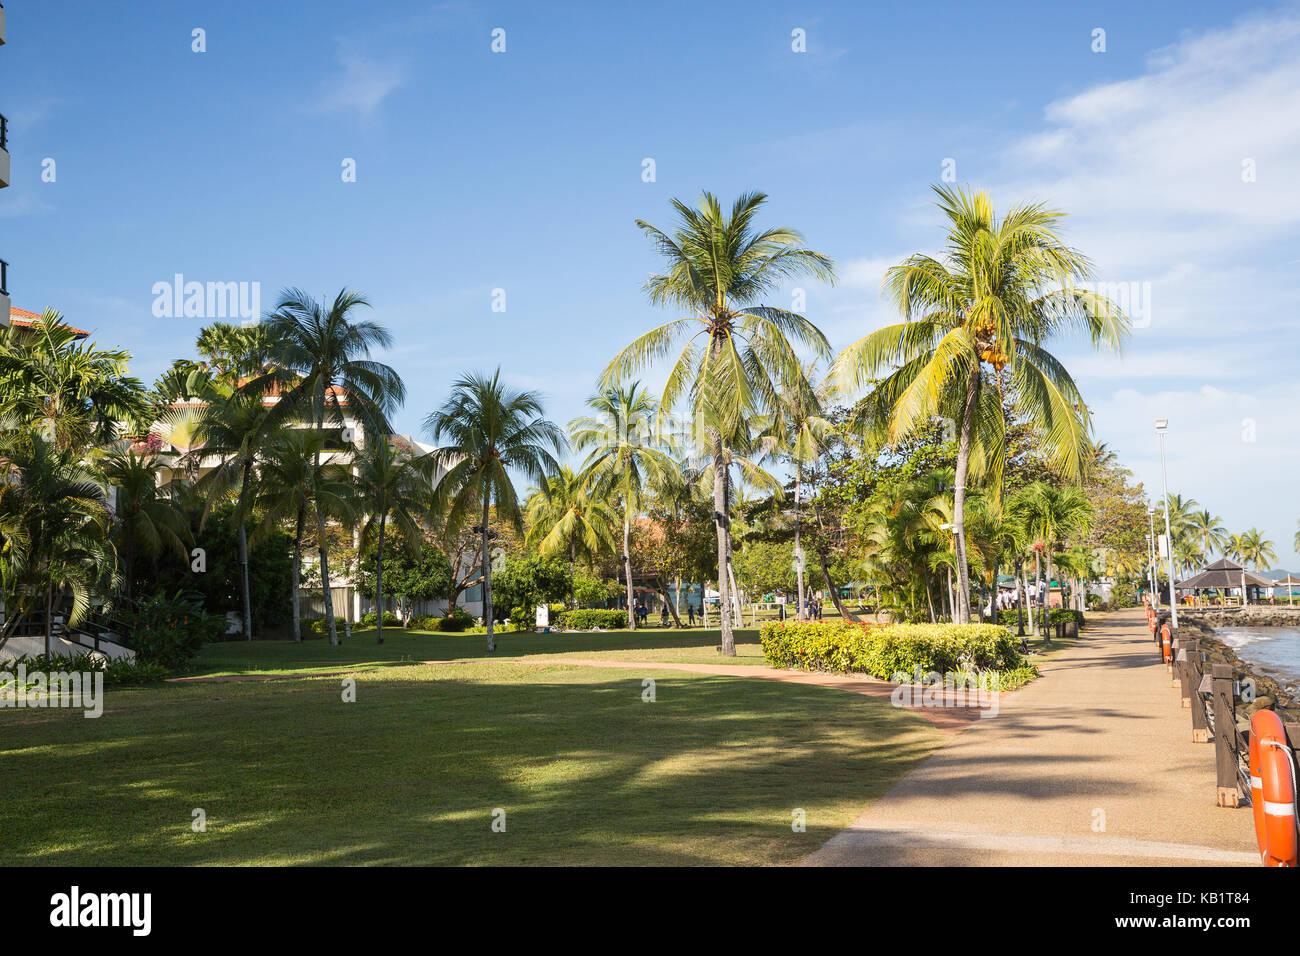 Palm Tree by the beach in Kota Kinabalu - Stock Image